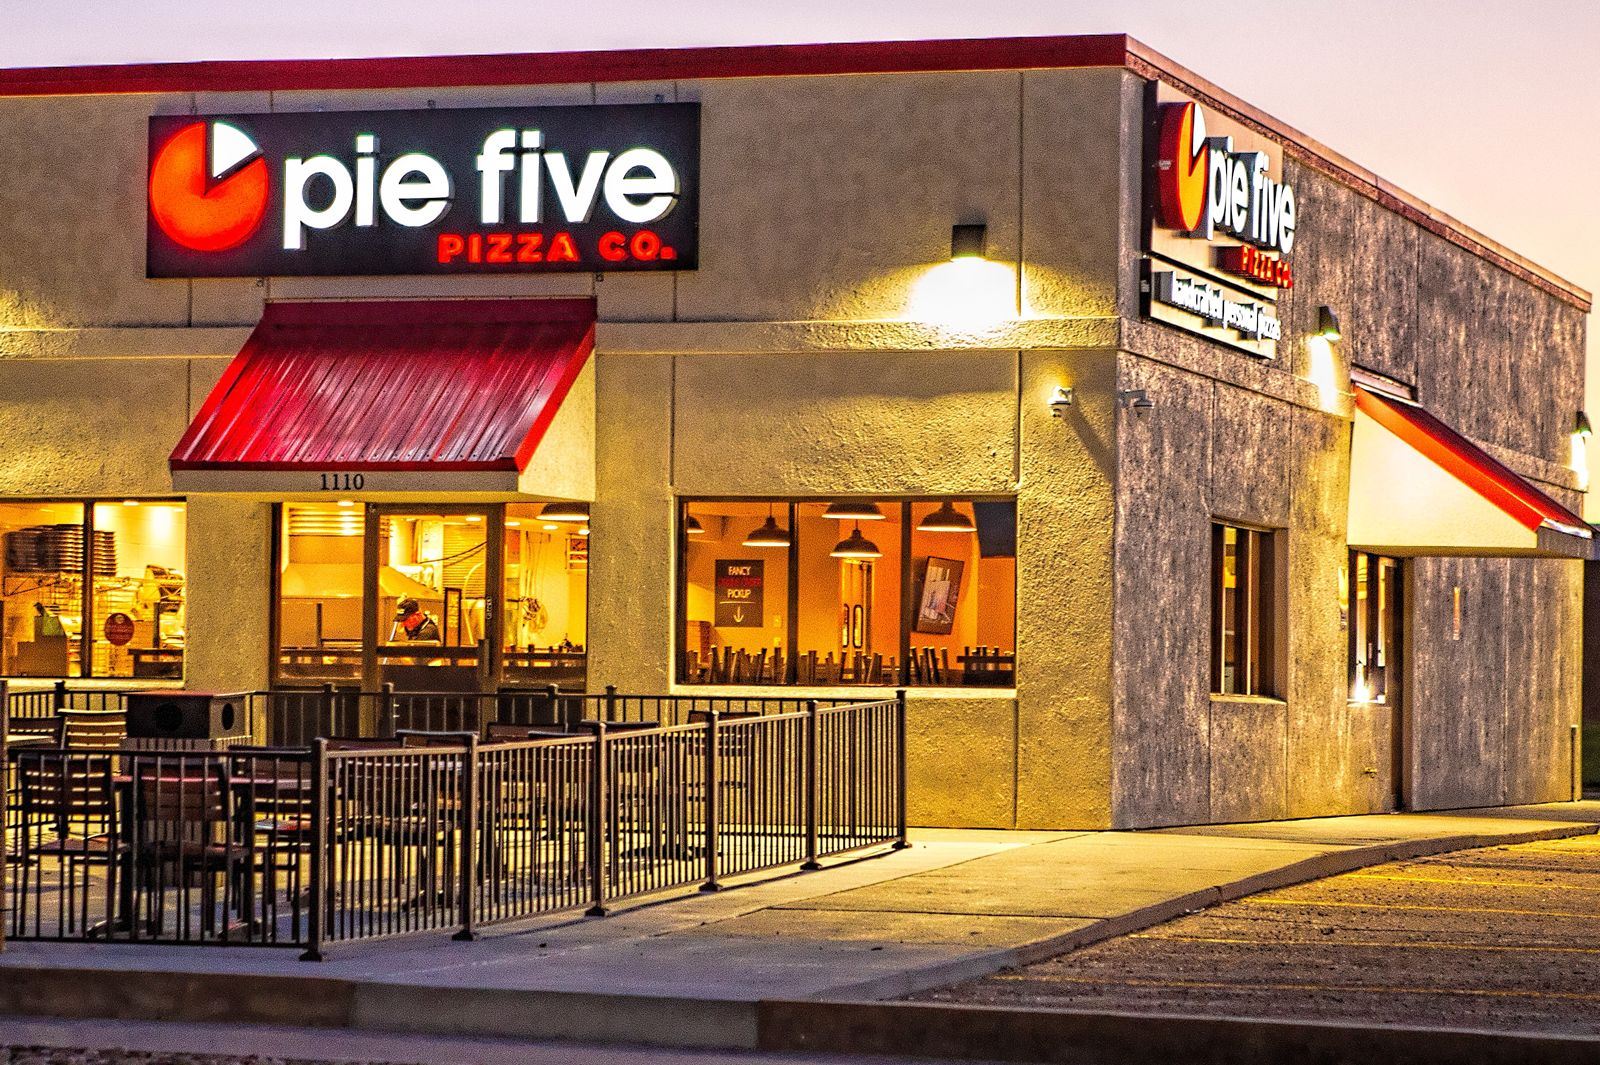 Pie Five Prepares to Make Its Prosper Debut